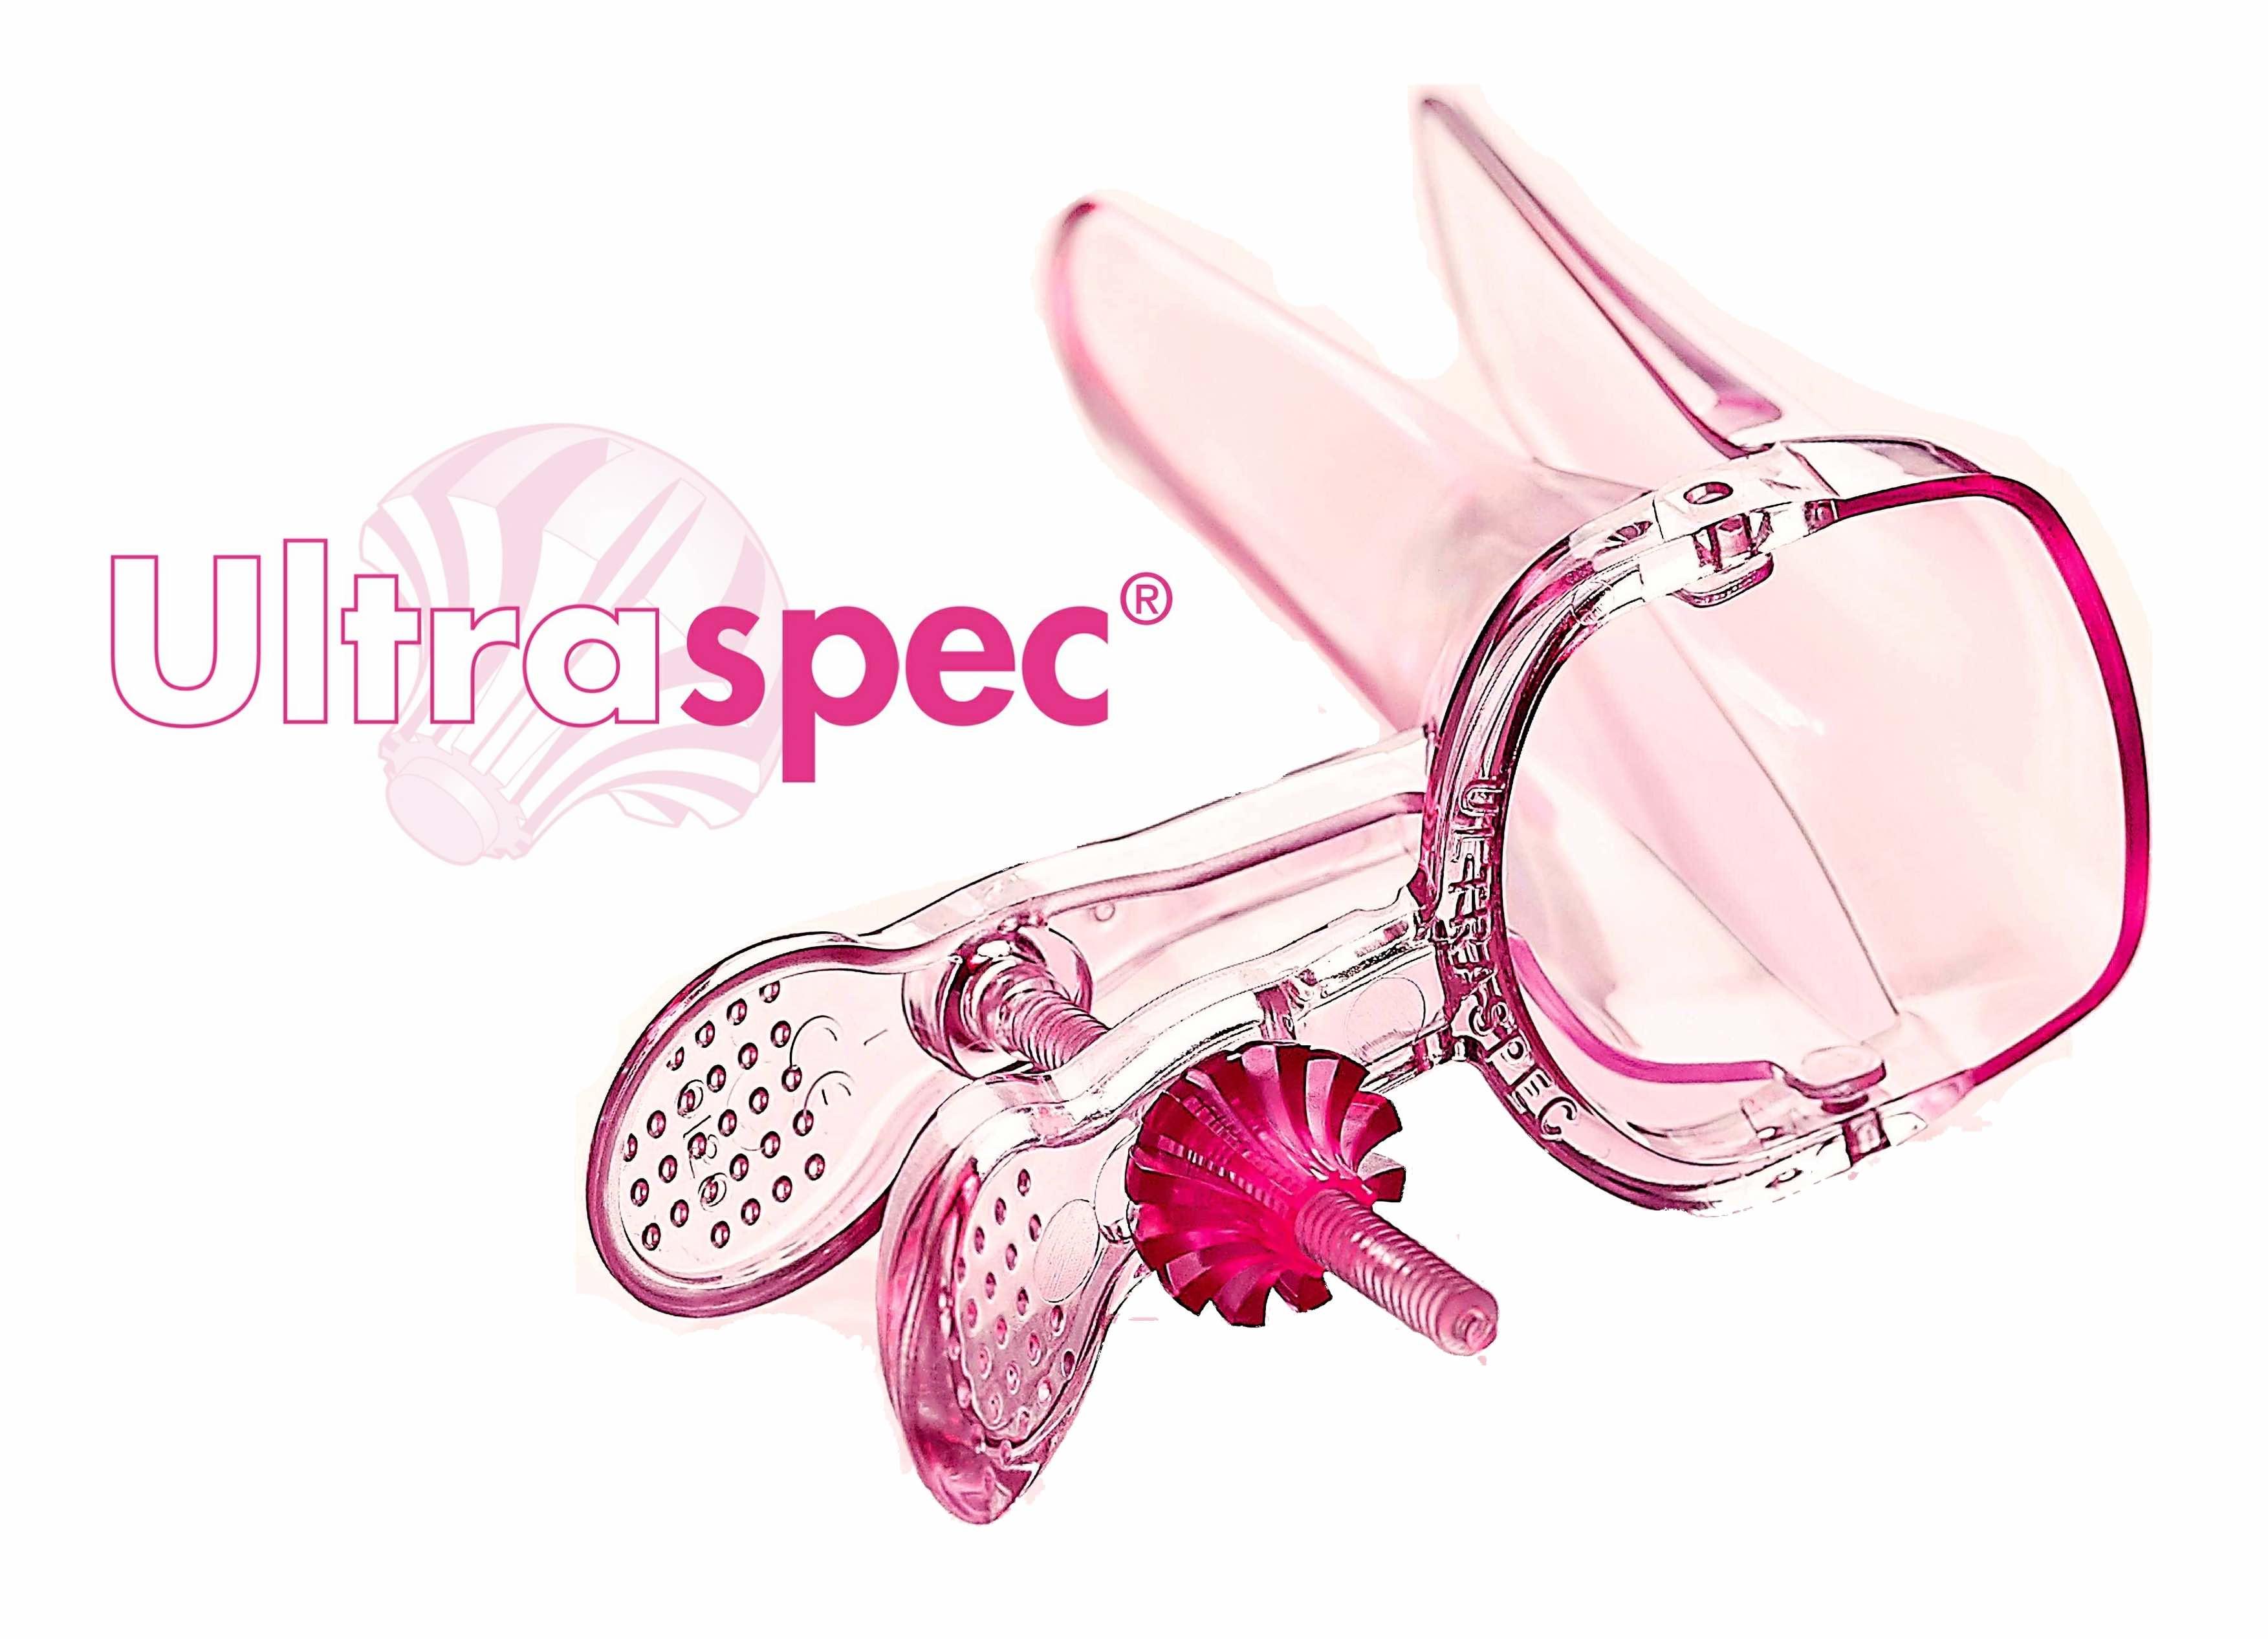 Ultraspec Vaginal Speculum - Small | Medical Supermarket